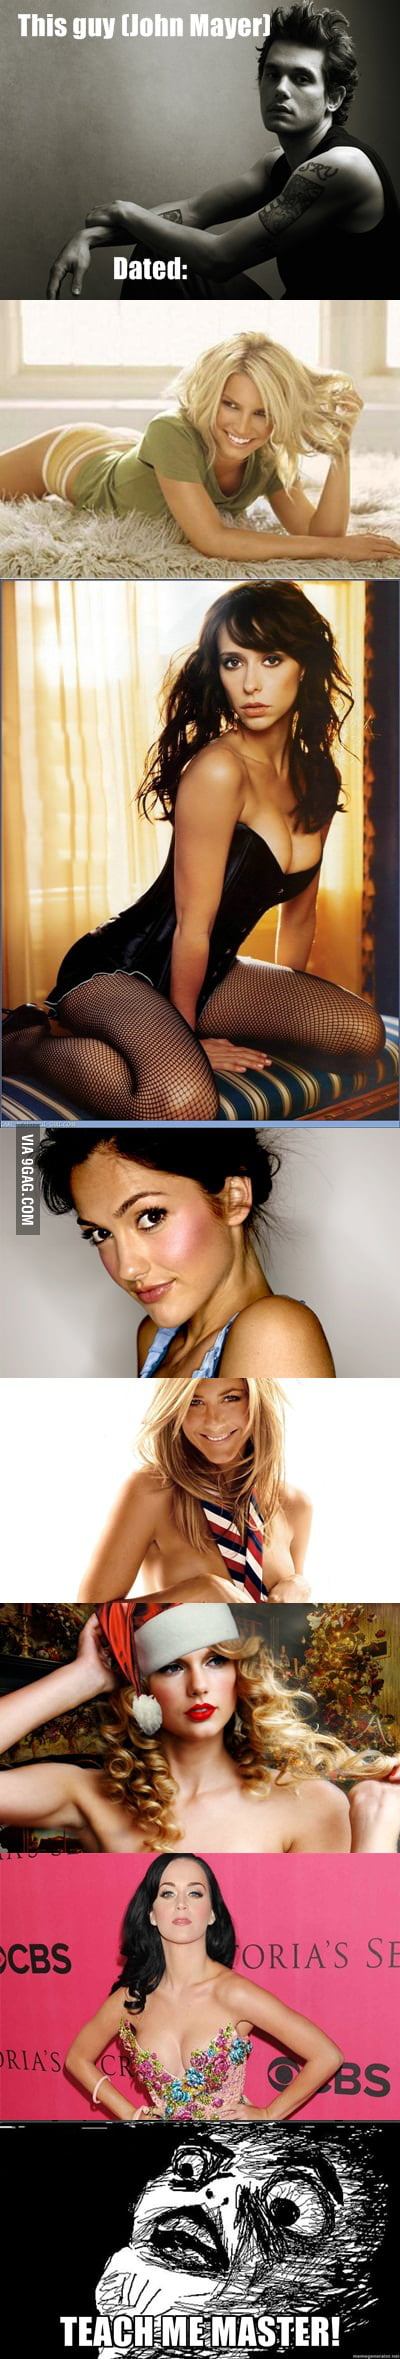 Why not Megan Fox?